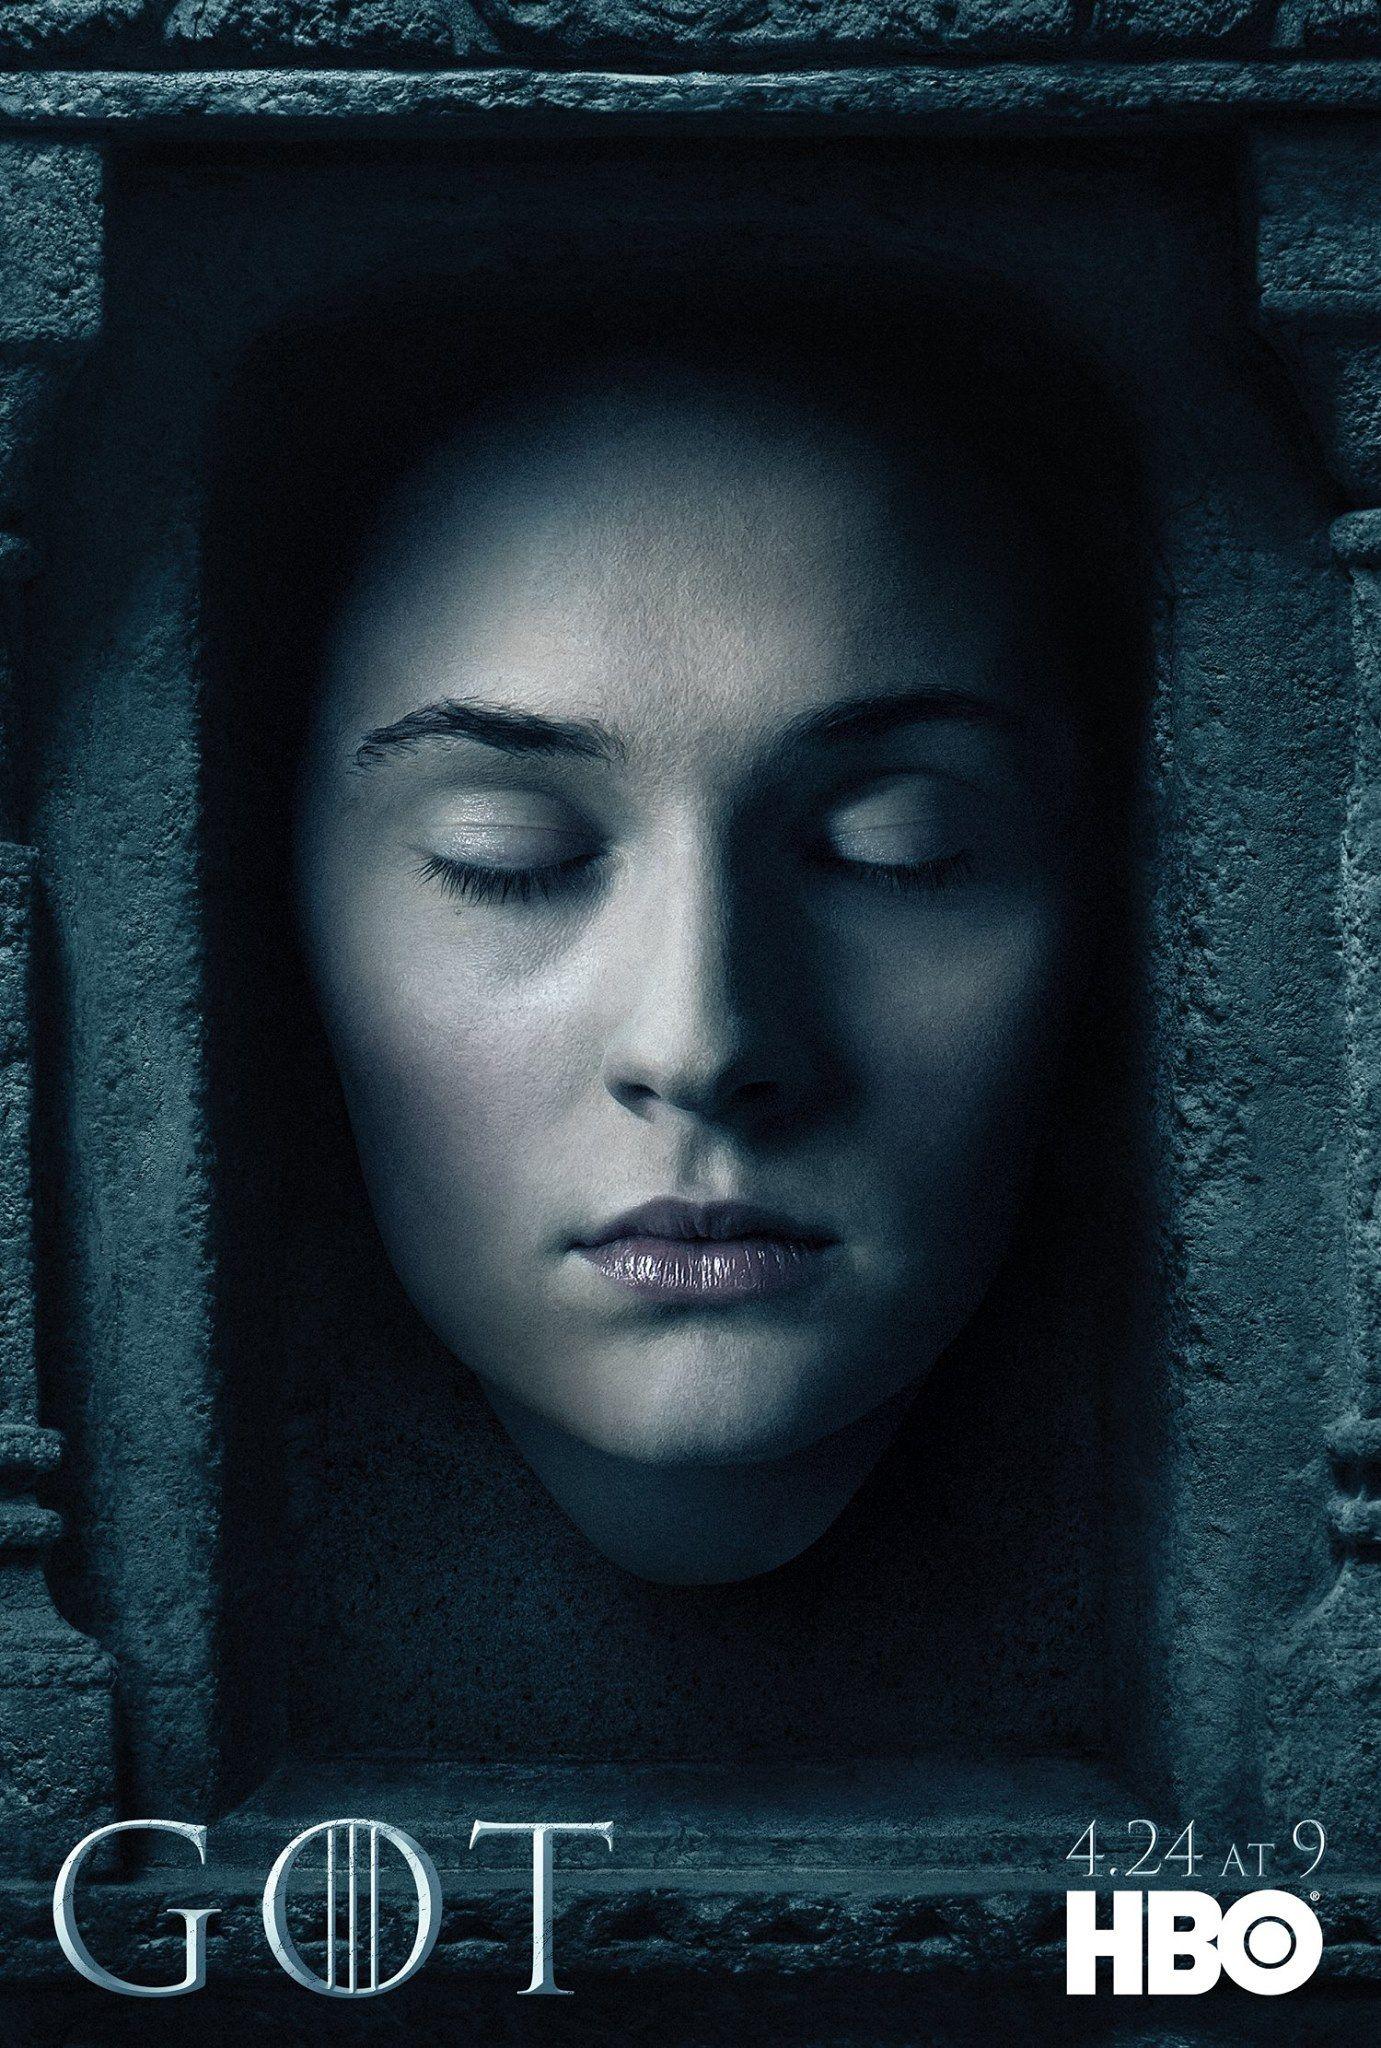 Game Of Thrones Character Posters Debut For Season 6 Sansa Stark Juego De Tronos Game Of Thrones